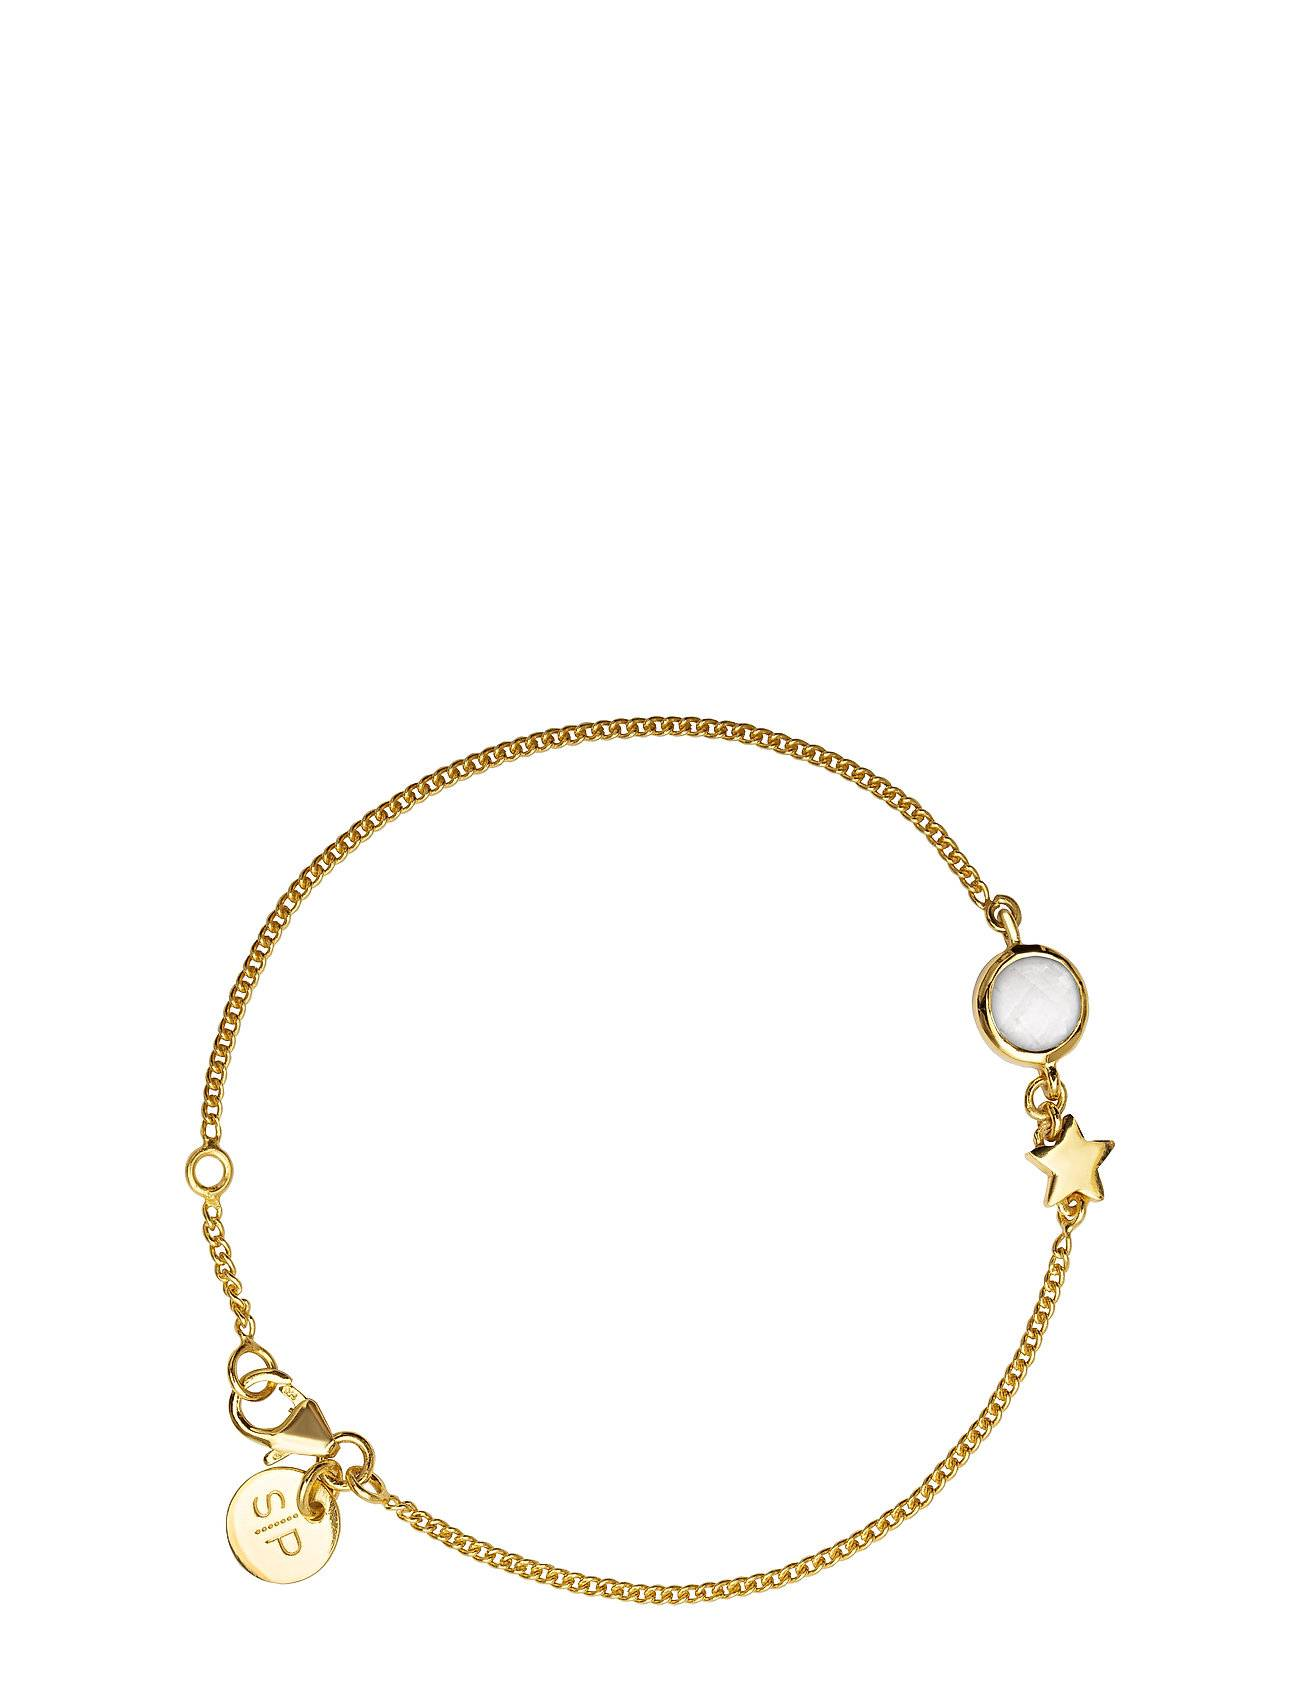 Syster P Priscilla Bracelet Gold Moonstone